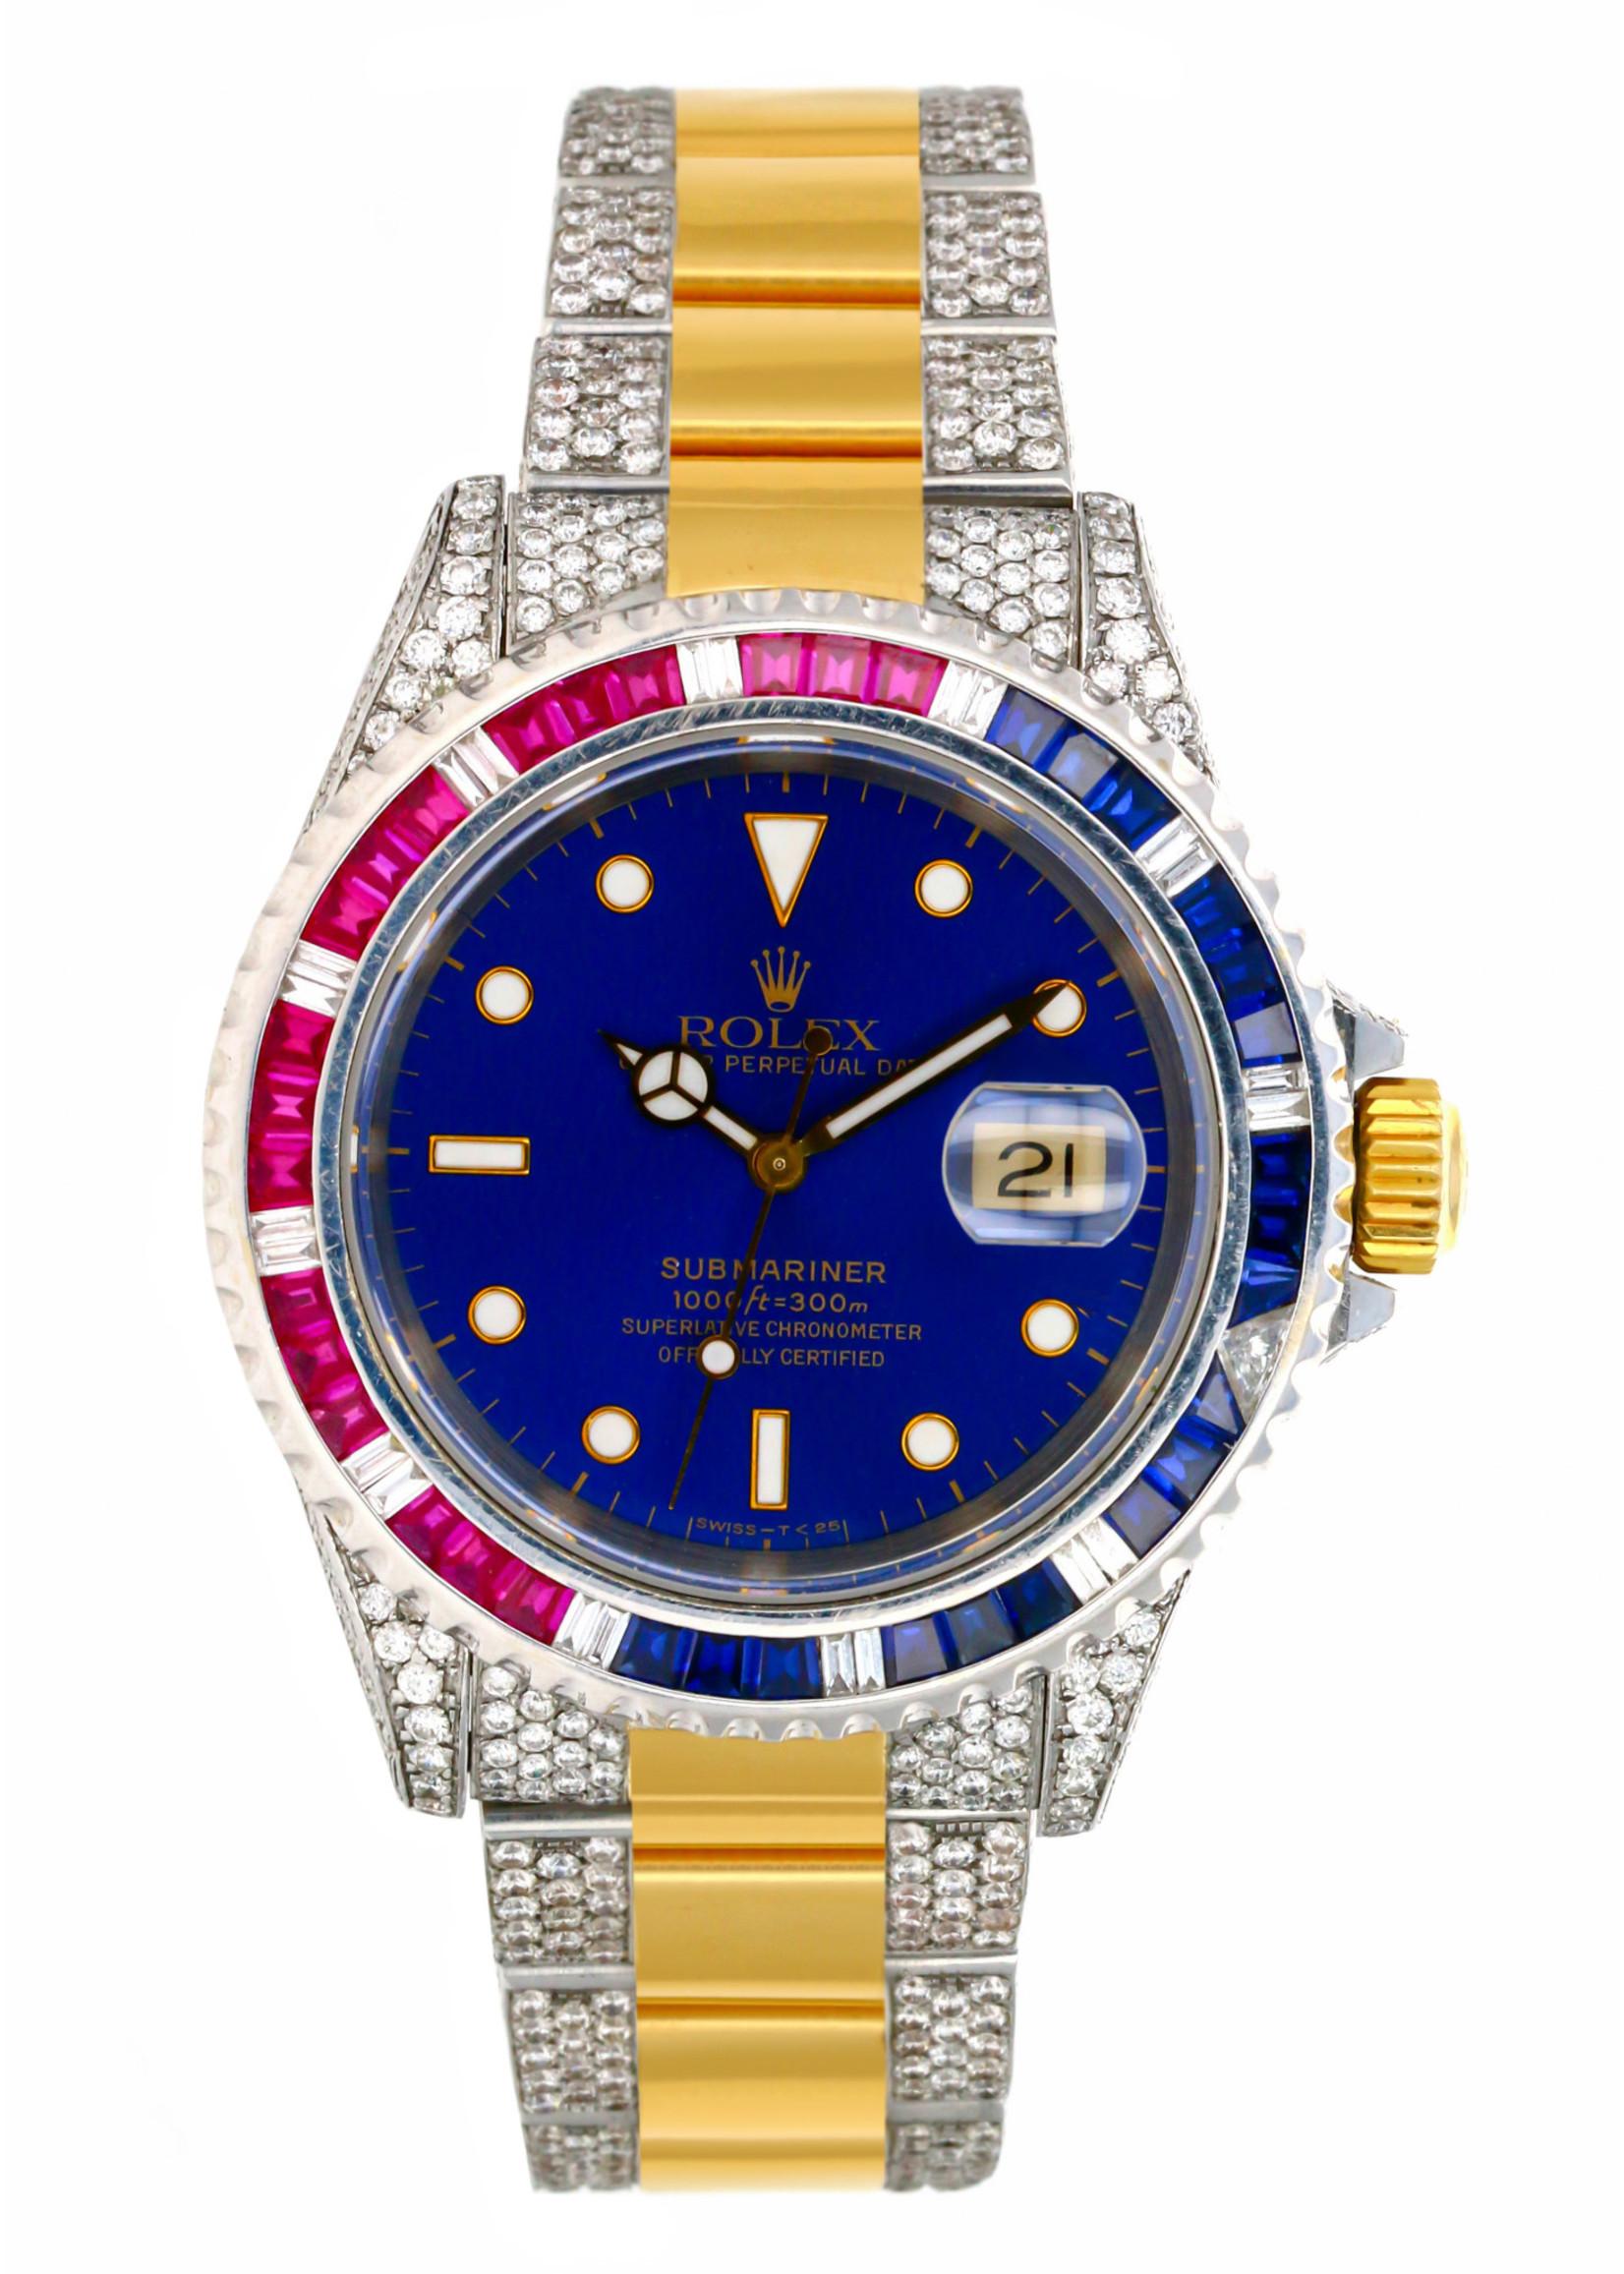 Rolex Watches ROLEX SUBMARINER 40MM #16613 CUSTOM DIAMONDS